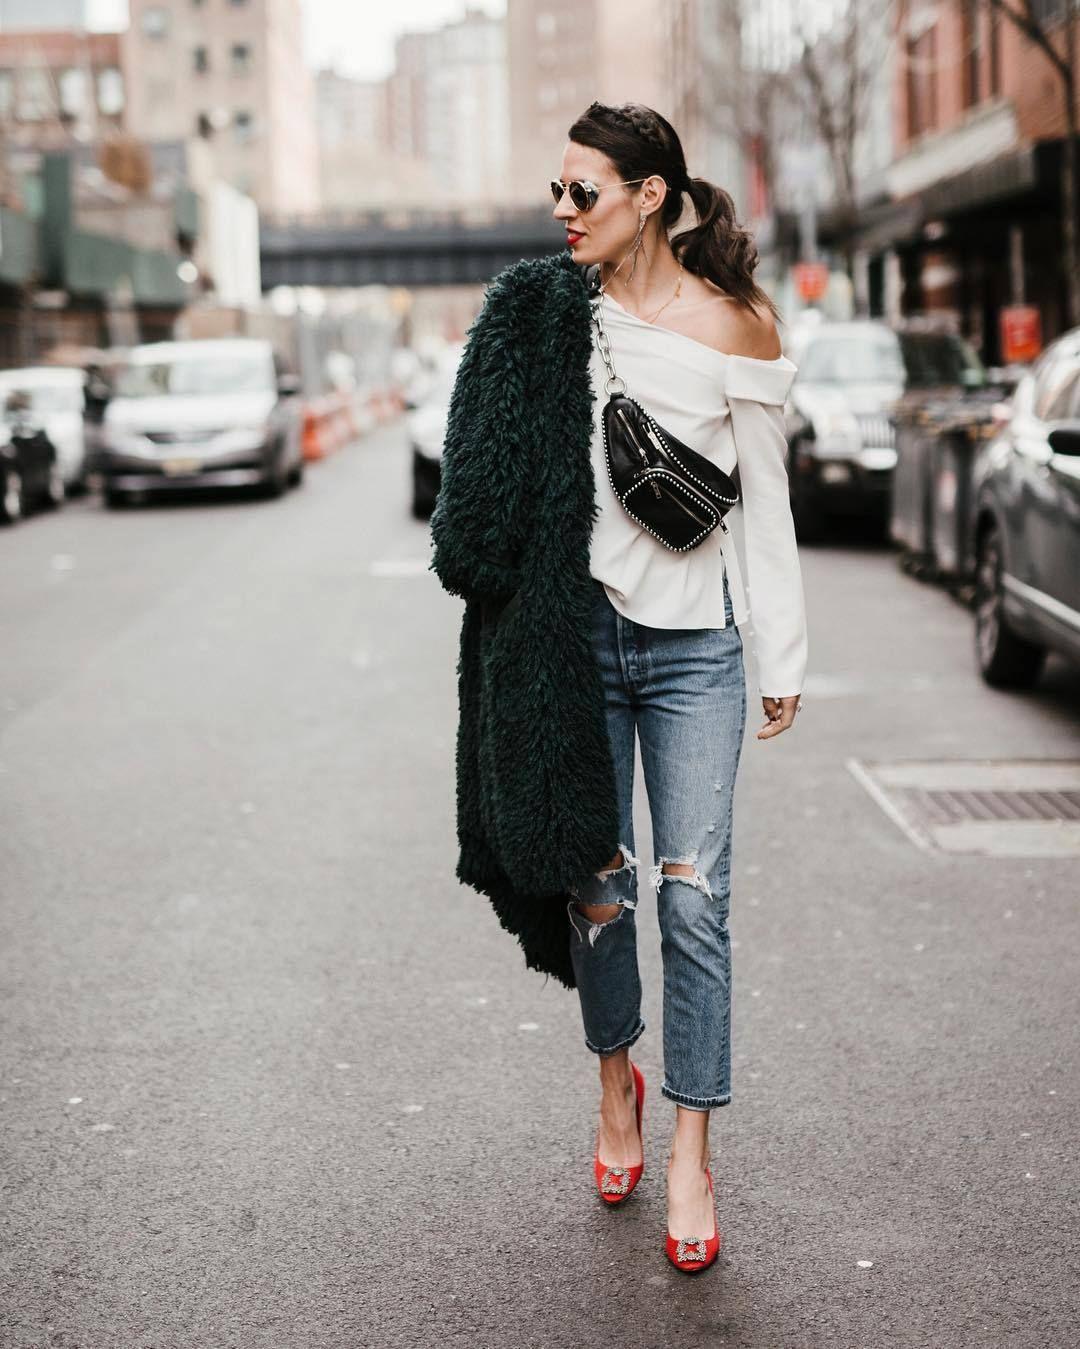 Get the jeans for $108 at revolve.com – Wheretoget